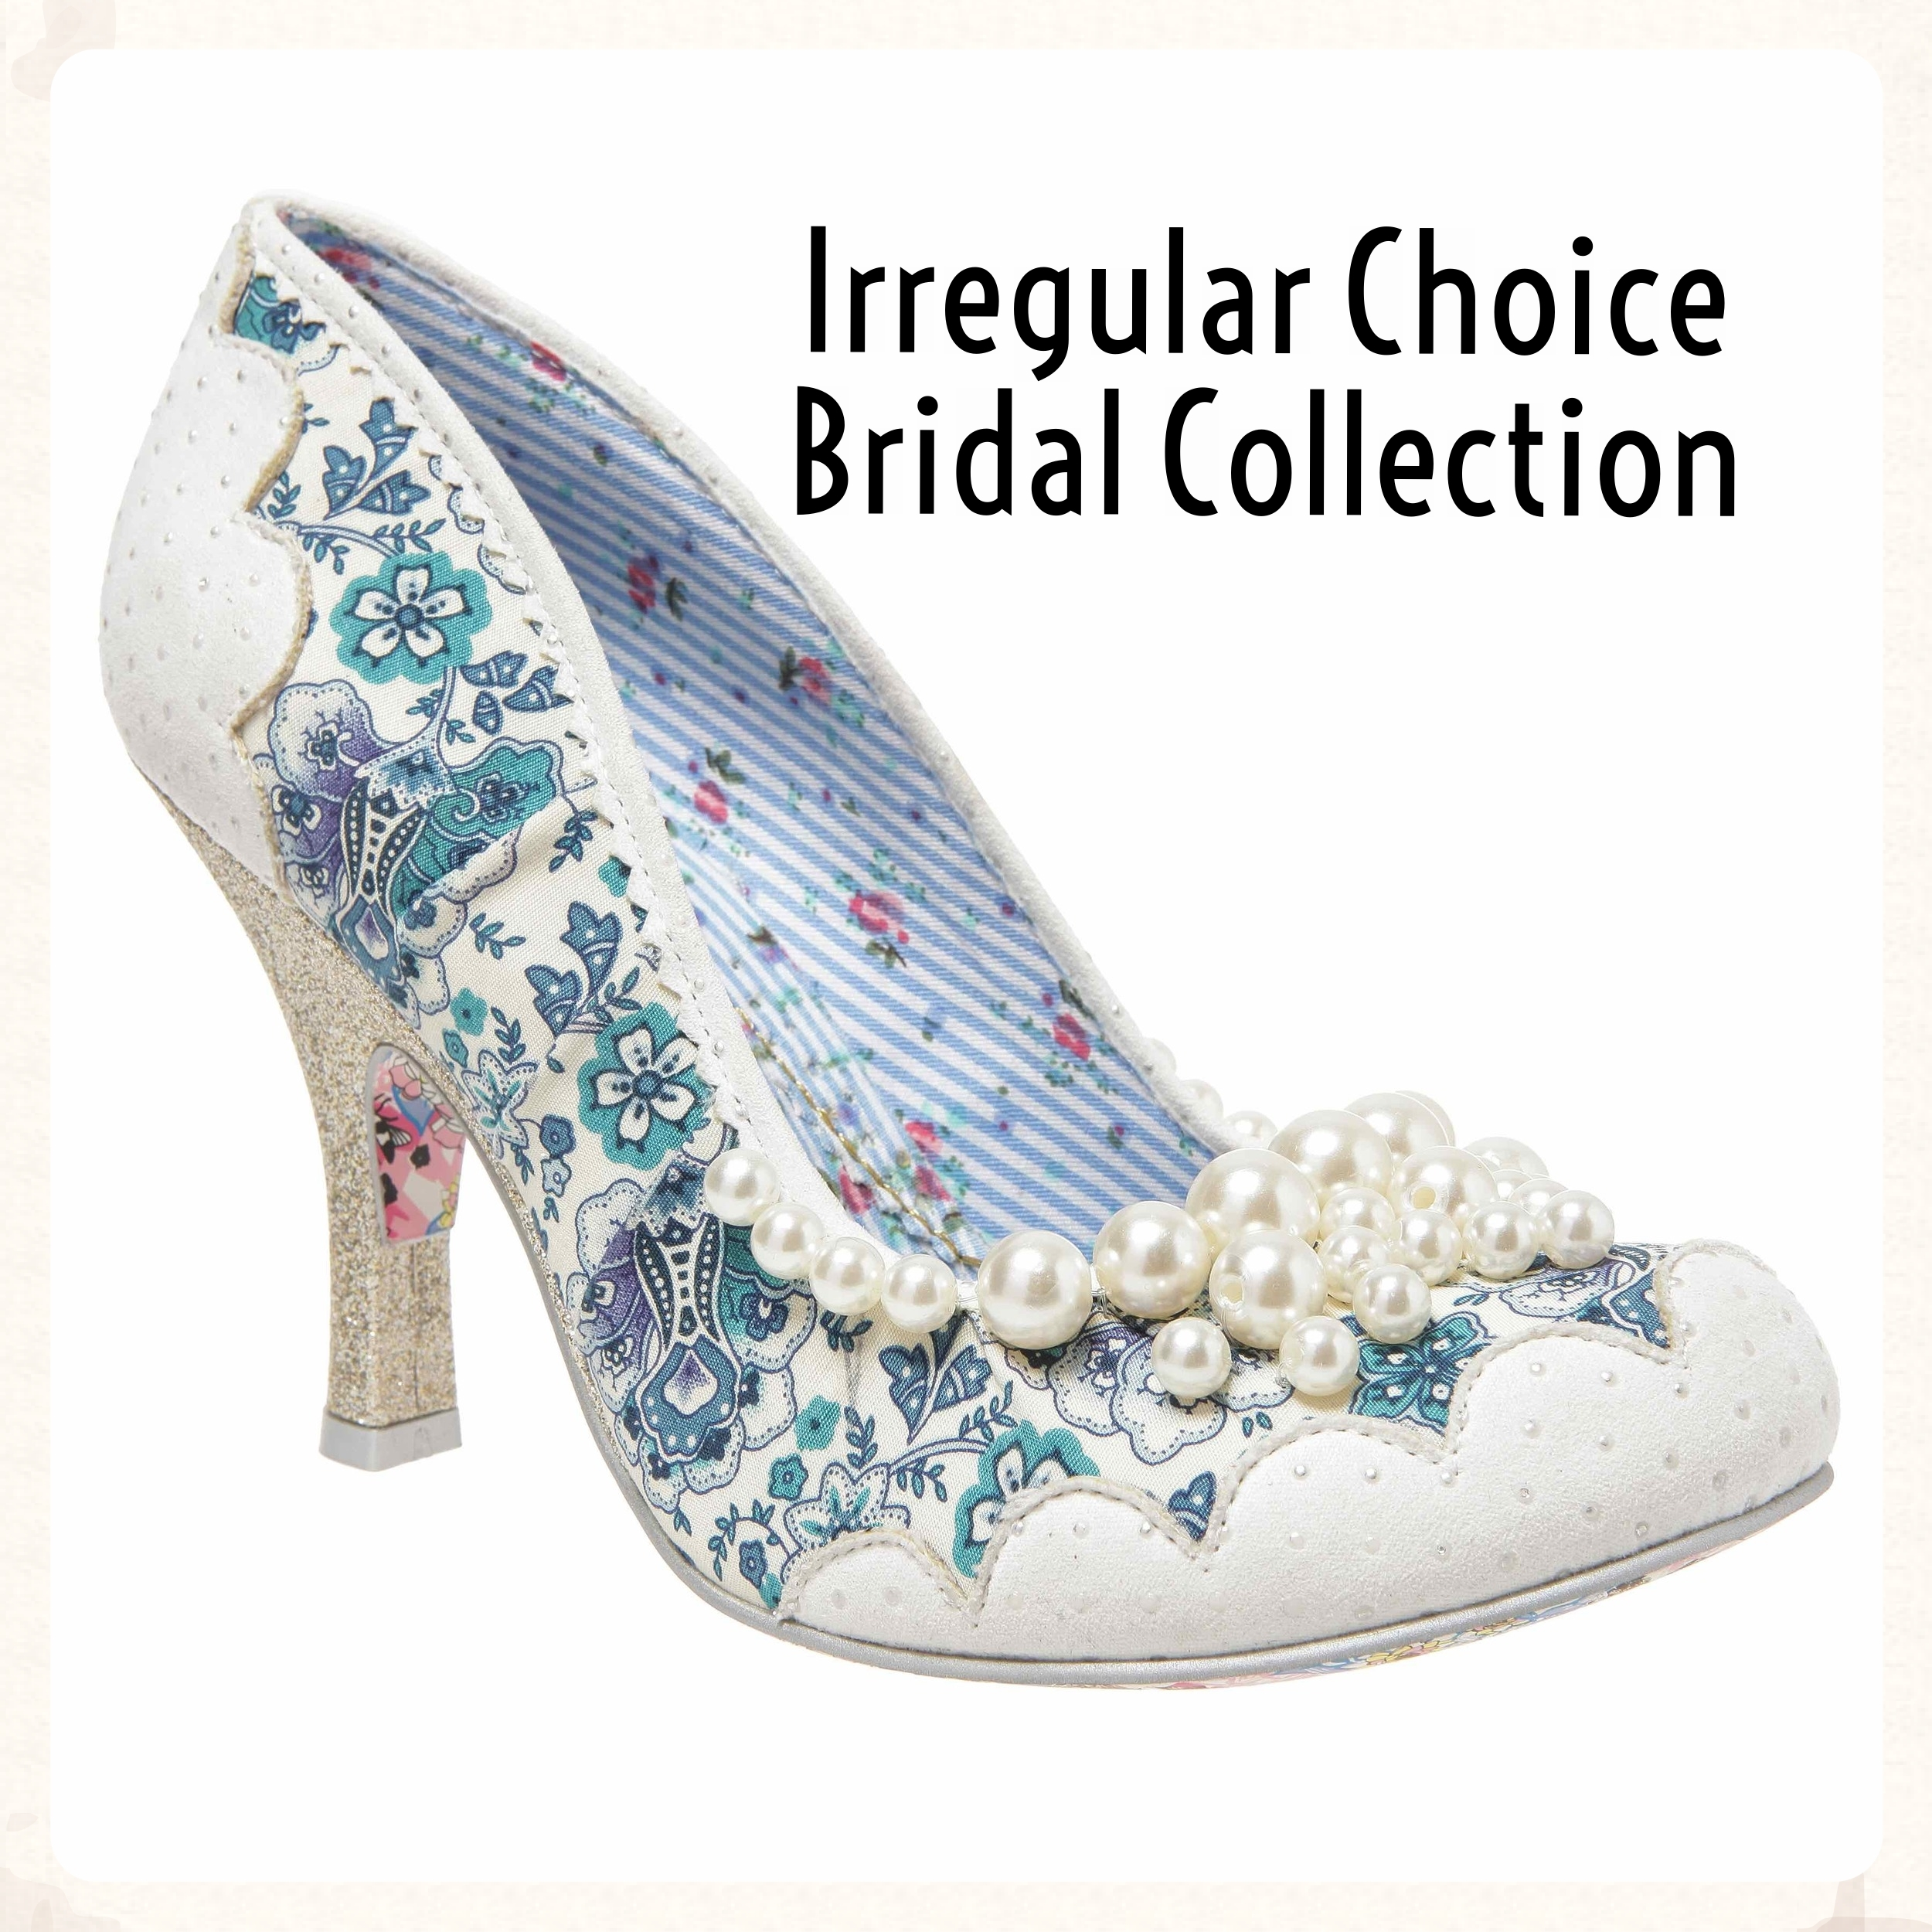 Irregular Choice Bridal Collection